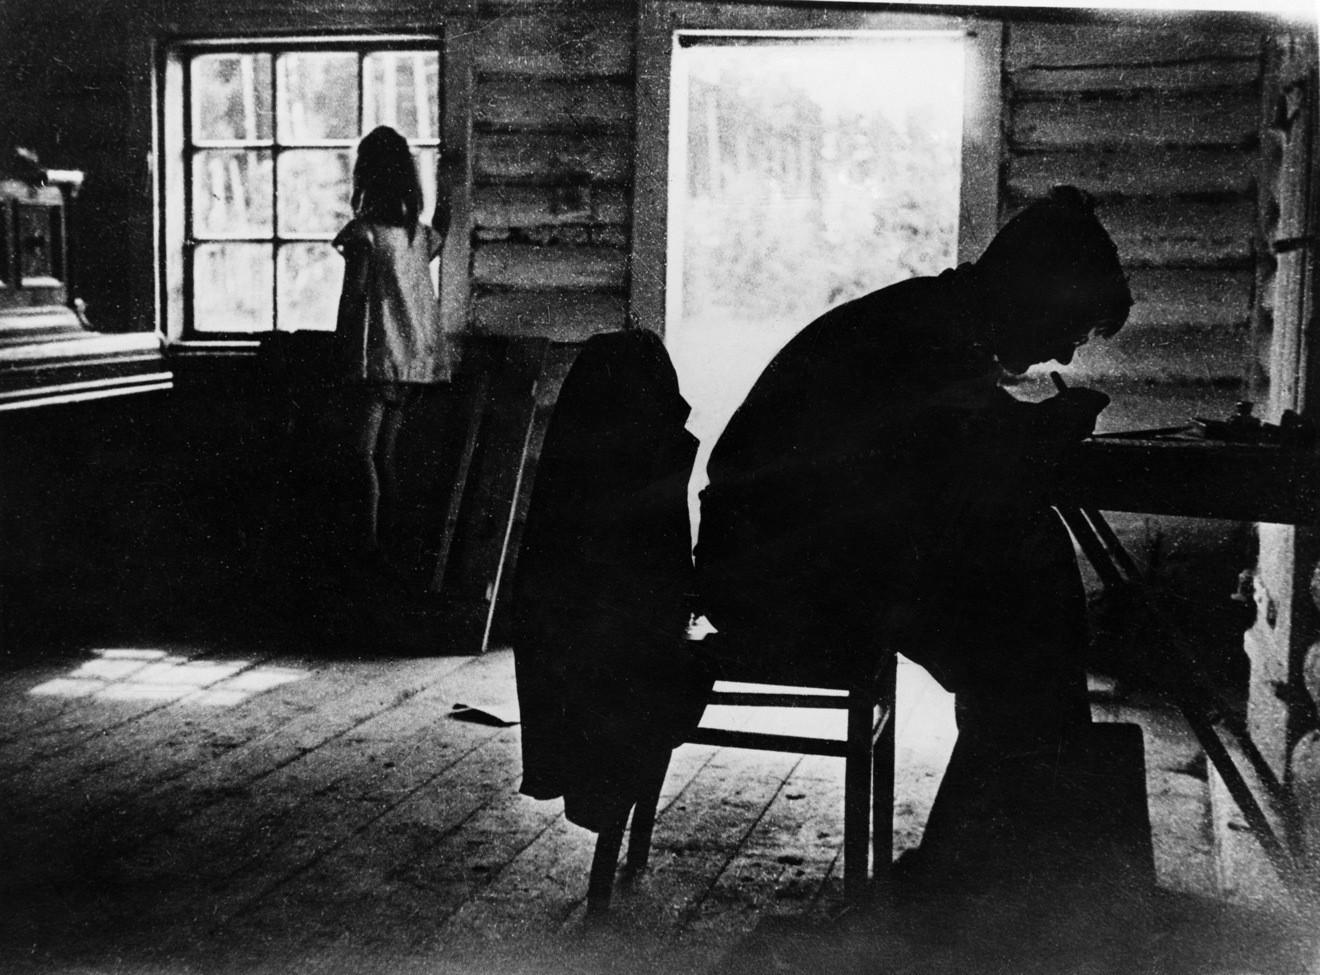 Дмитрий Шостакович за работой в компании дочери. 1943 год                                                                                           © Universal Images Group / Sovfoto / Diomedia